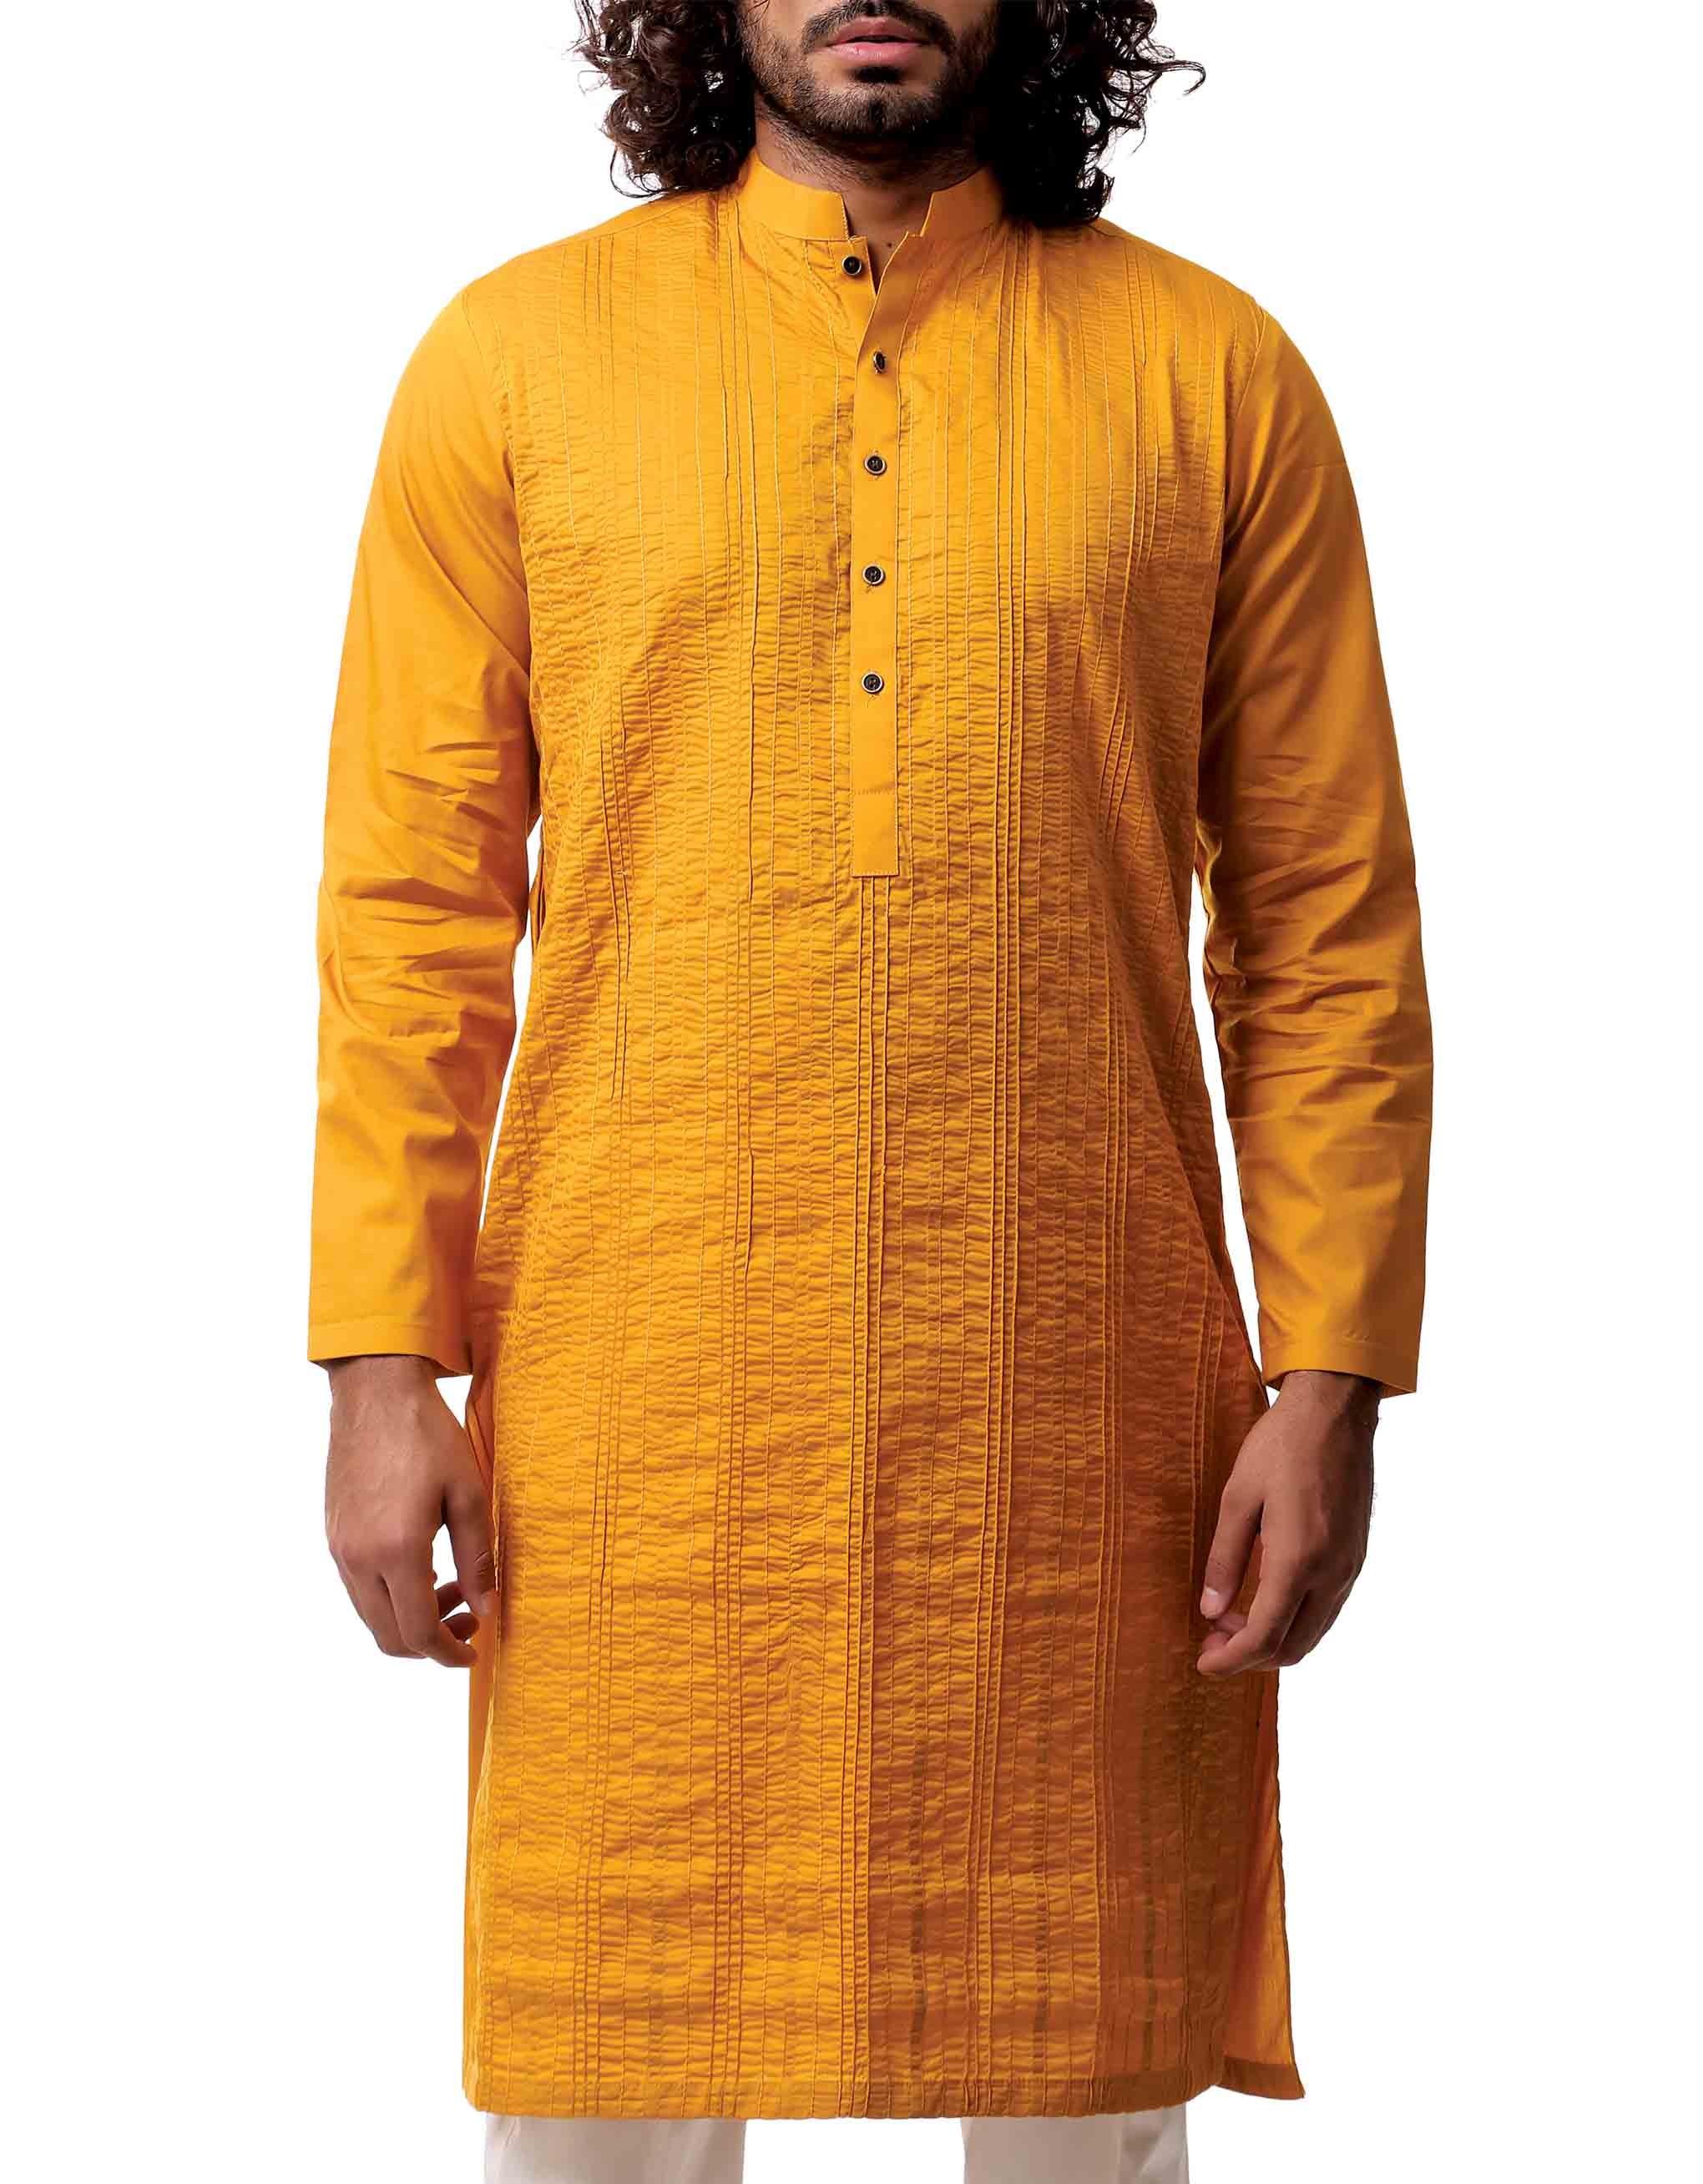 Men's kurta designs for eid